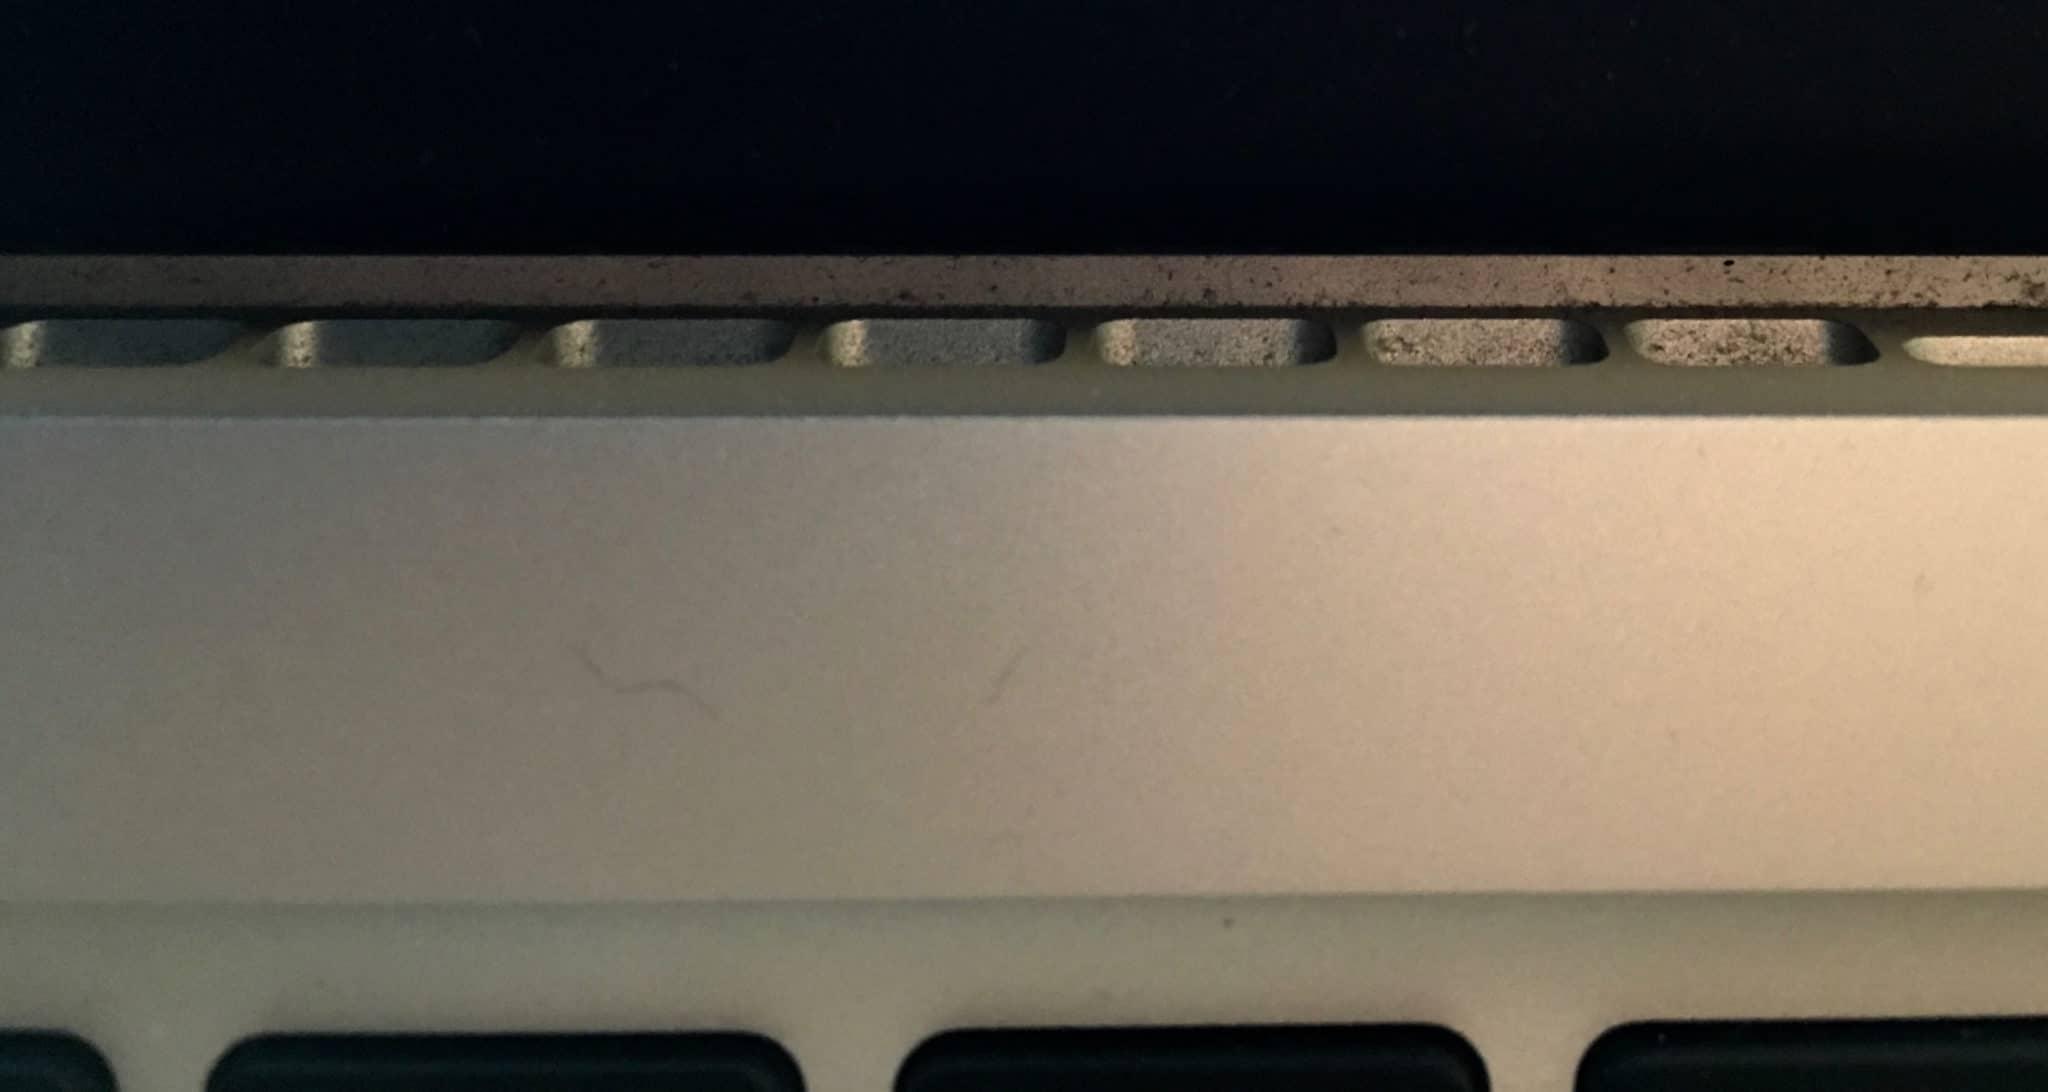 macbook pro vent